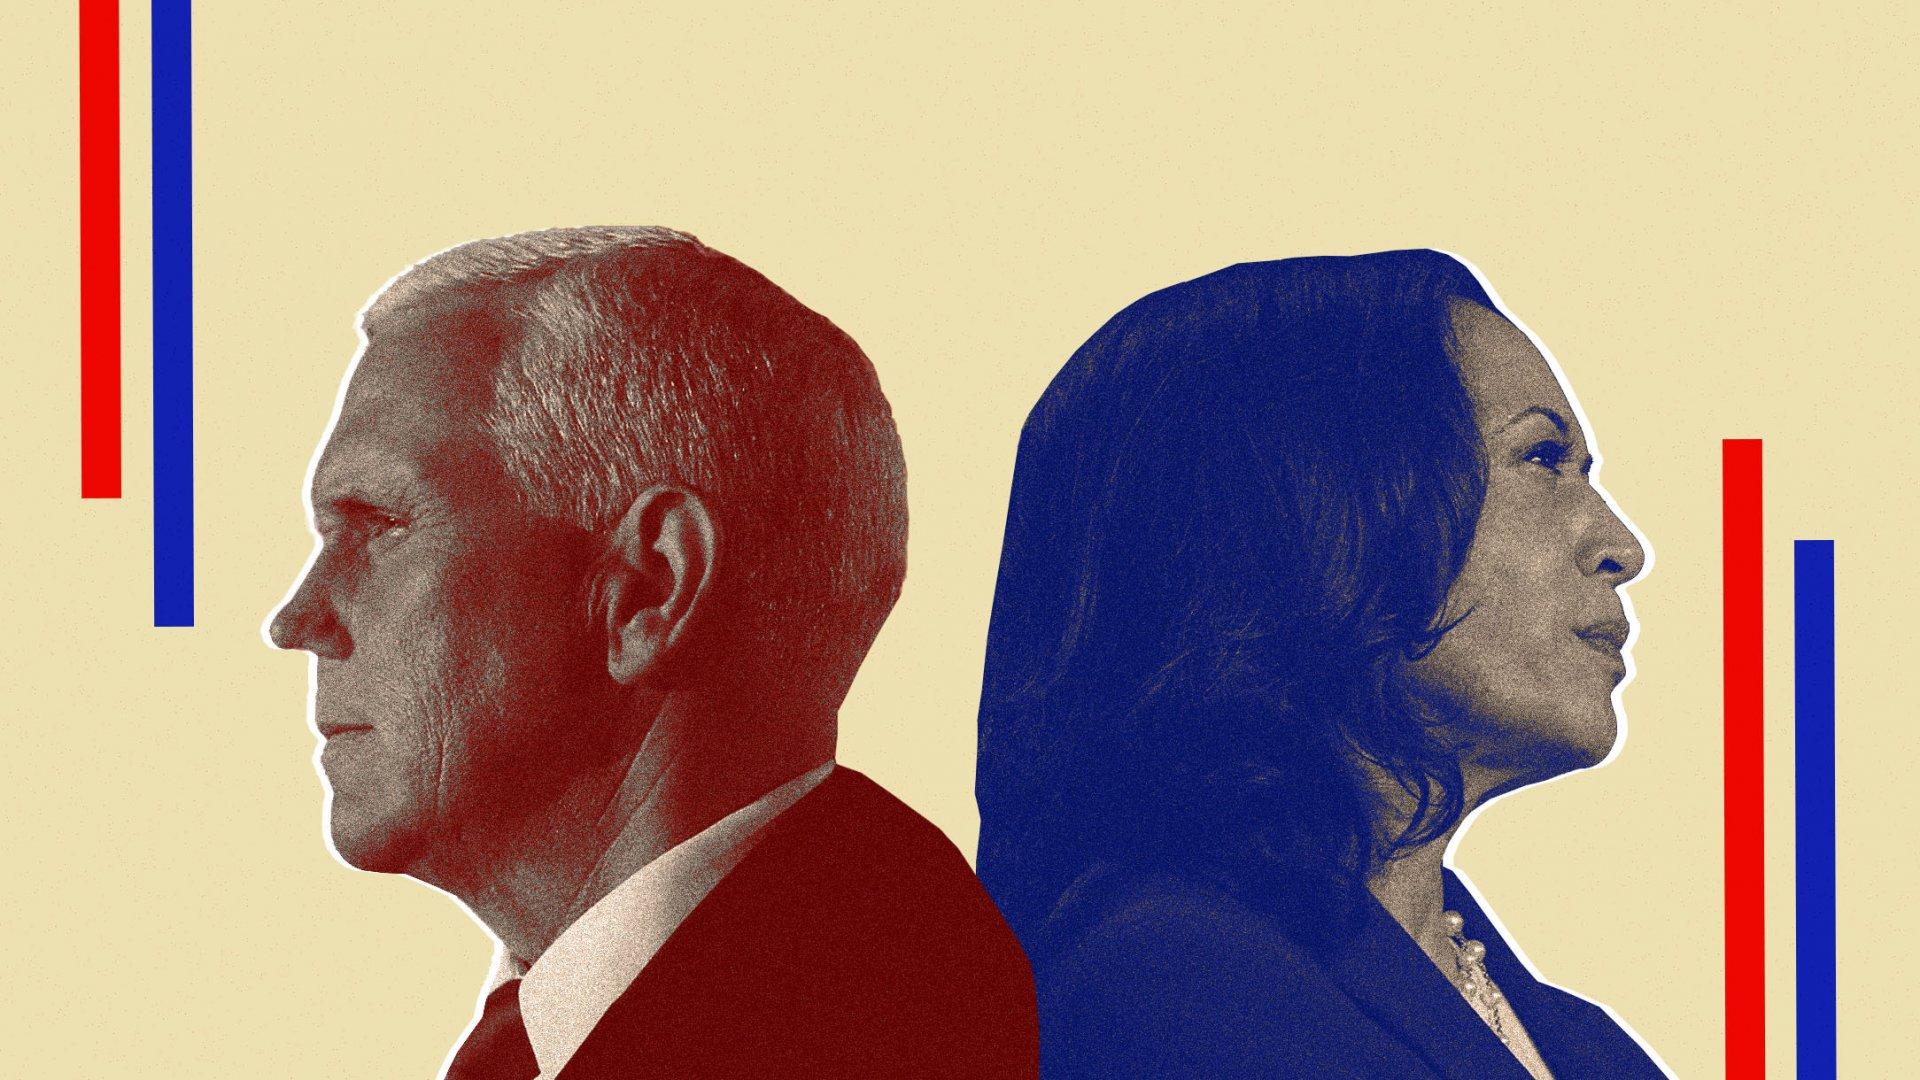 At VP Debate, Kamala Harris Gave a Master Class in Handling Someone Who Won't Stop Talking